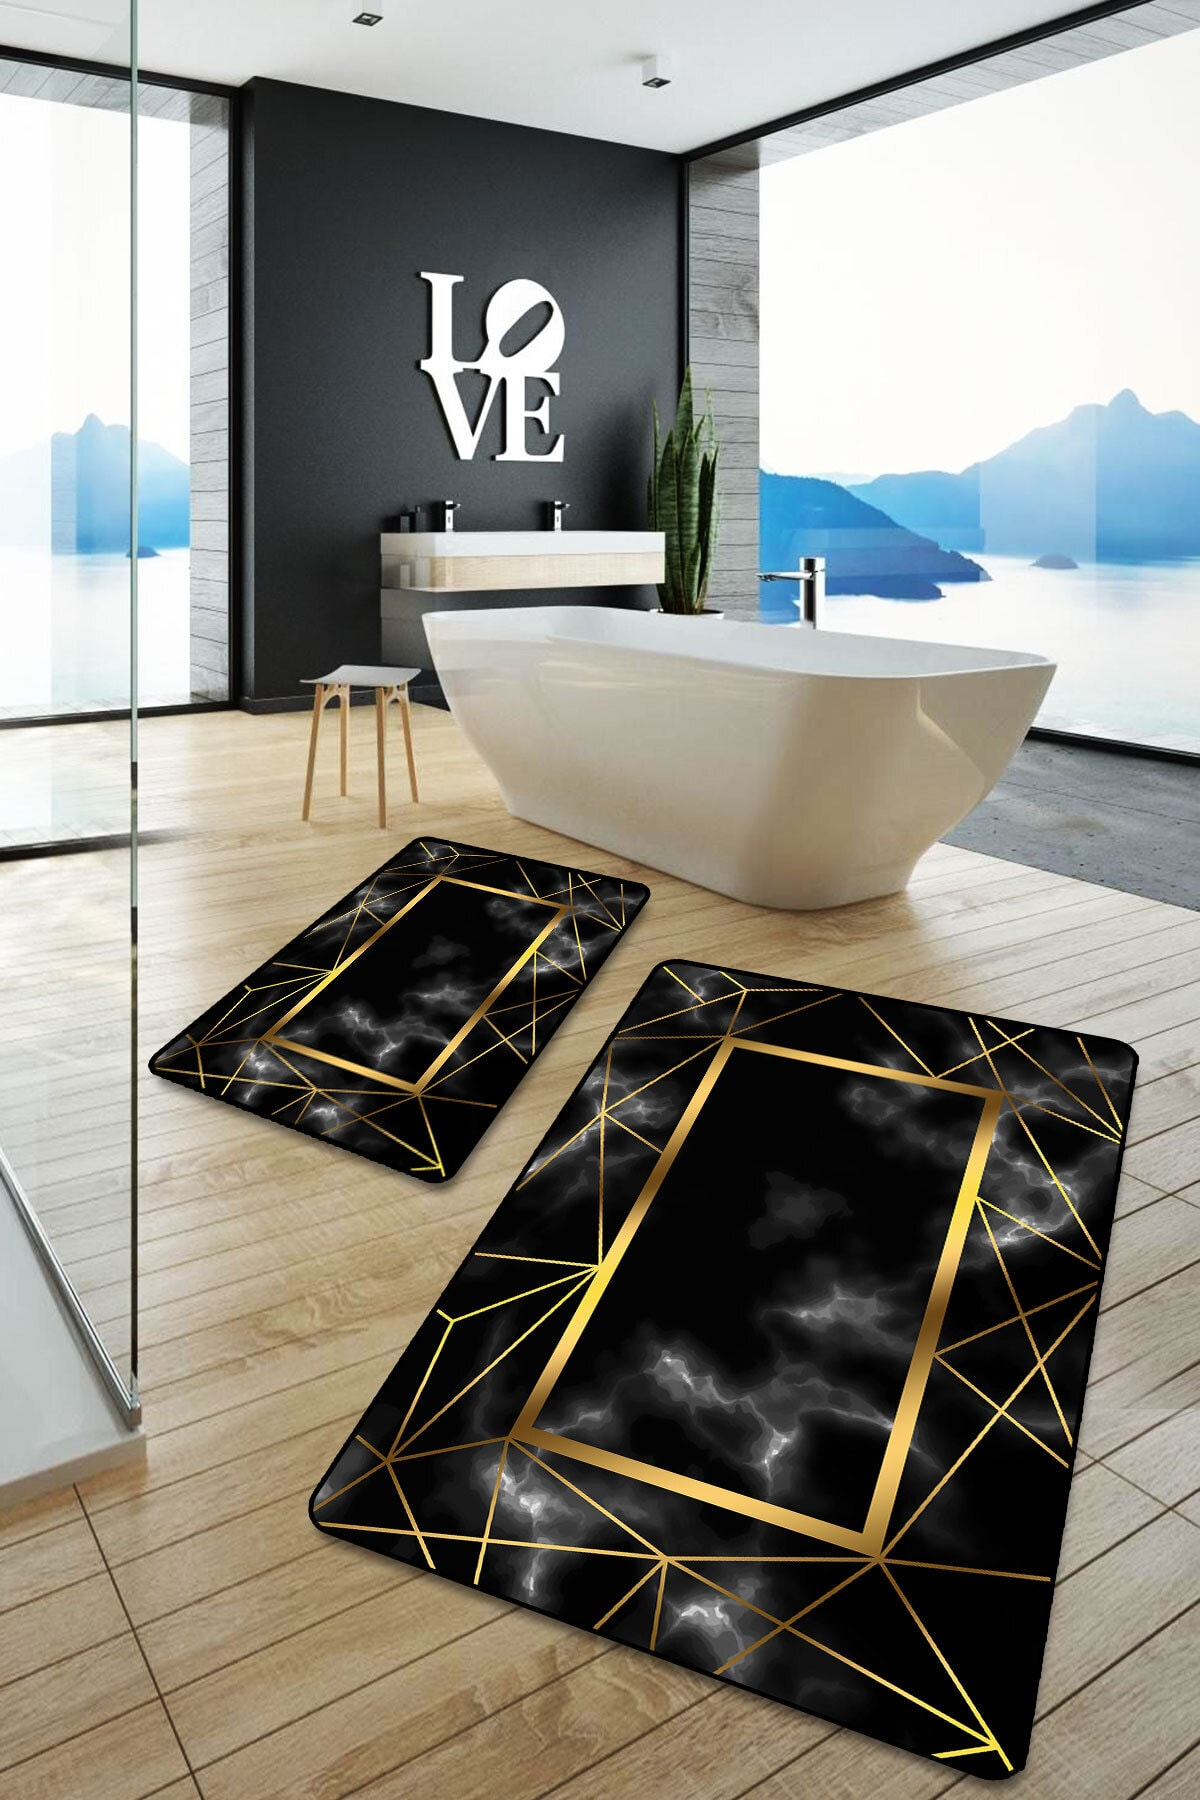 Siyah Üzeri Altın Çizgili Modern Yıkanabilir 2'li Banyo Halısı Paspas